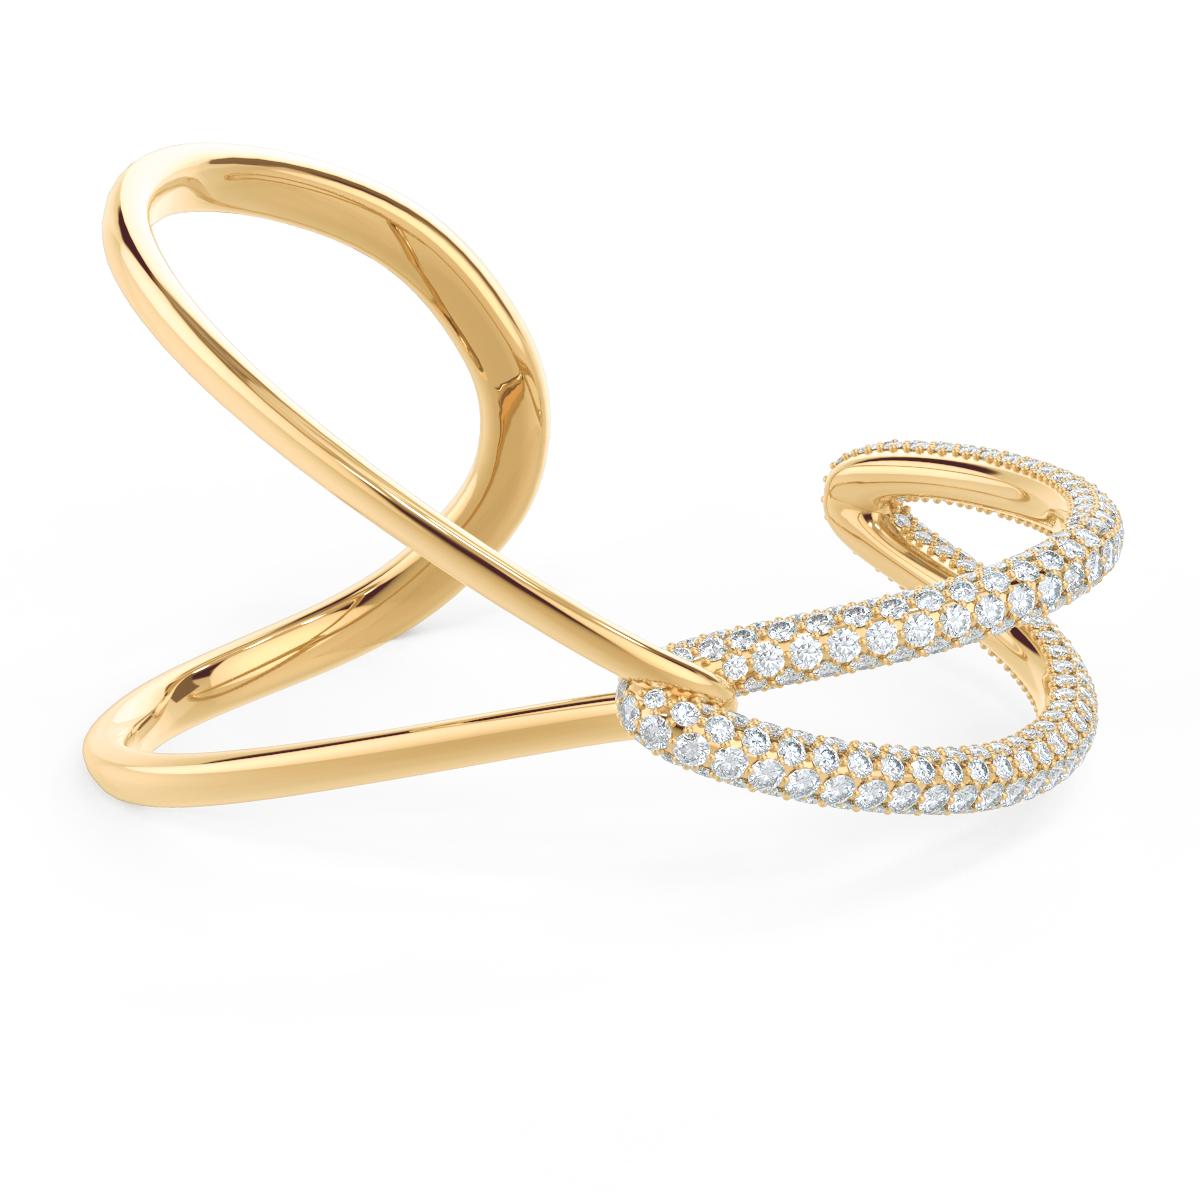 Lovelock Interlocking Lab Created Diamond Fashion Bracelet in Yellow Gold